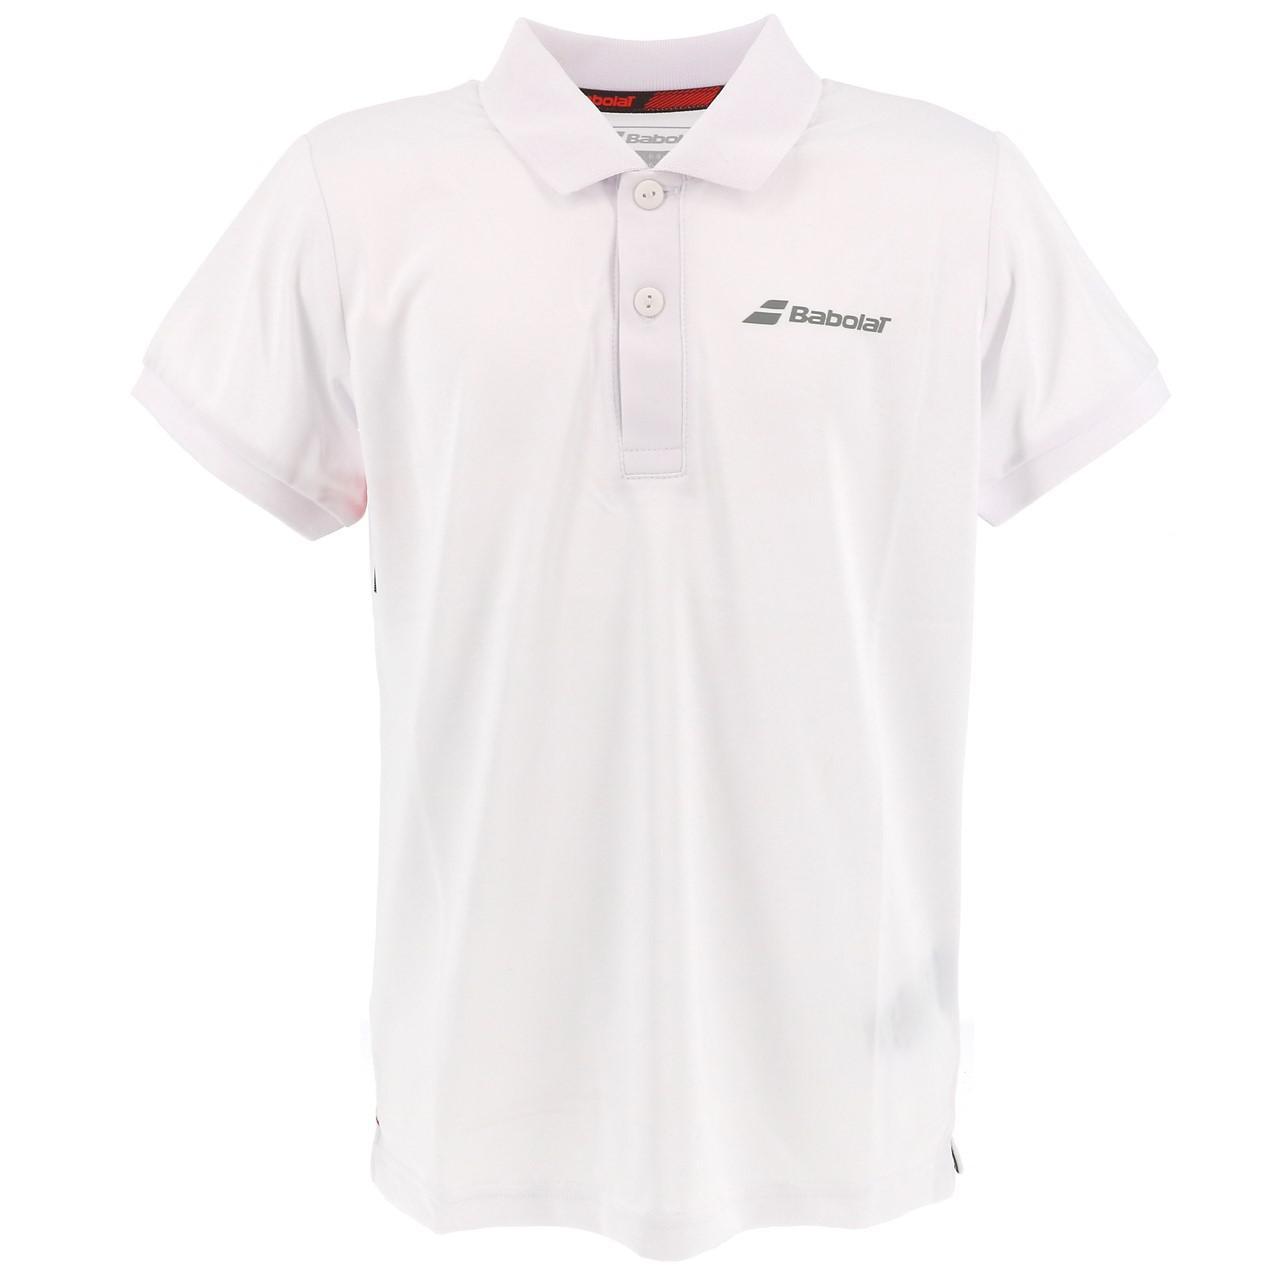 Polo-Von-Tennis-Babolat-Polo-Kind-Weiss-Weiss-71214-Neu